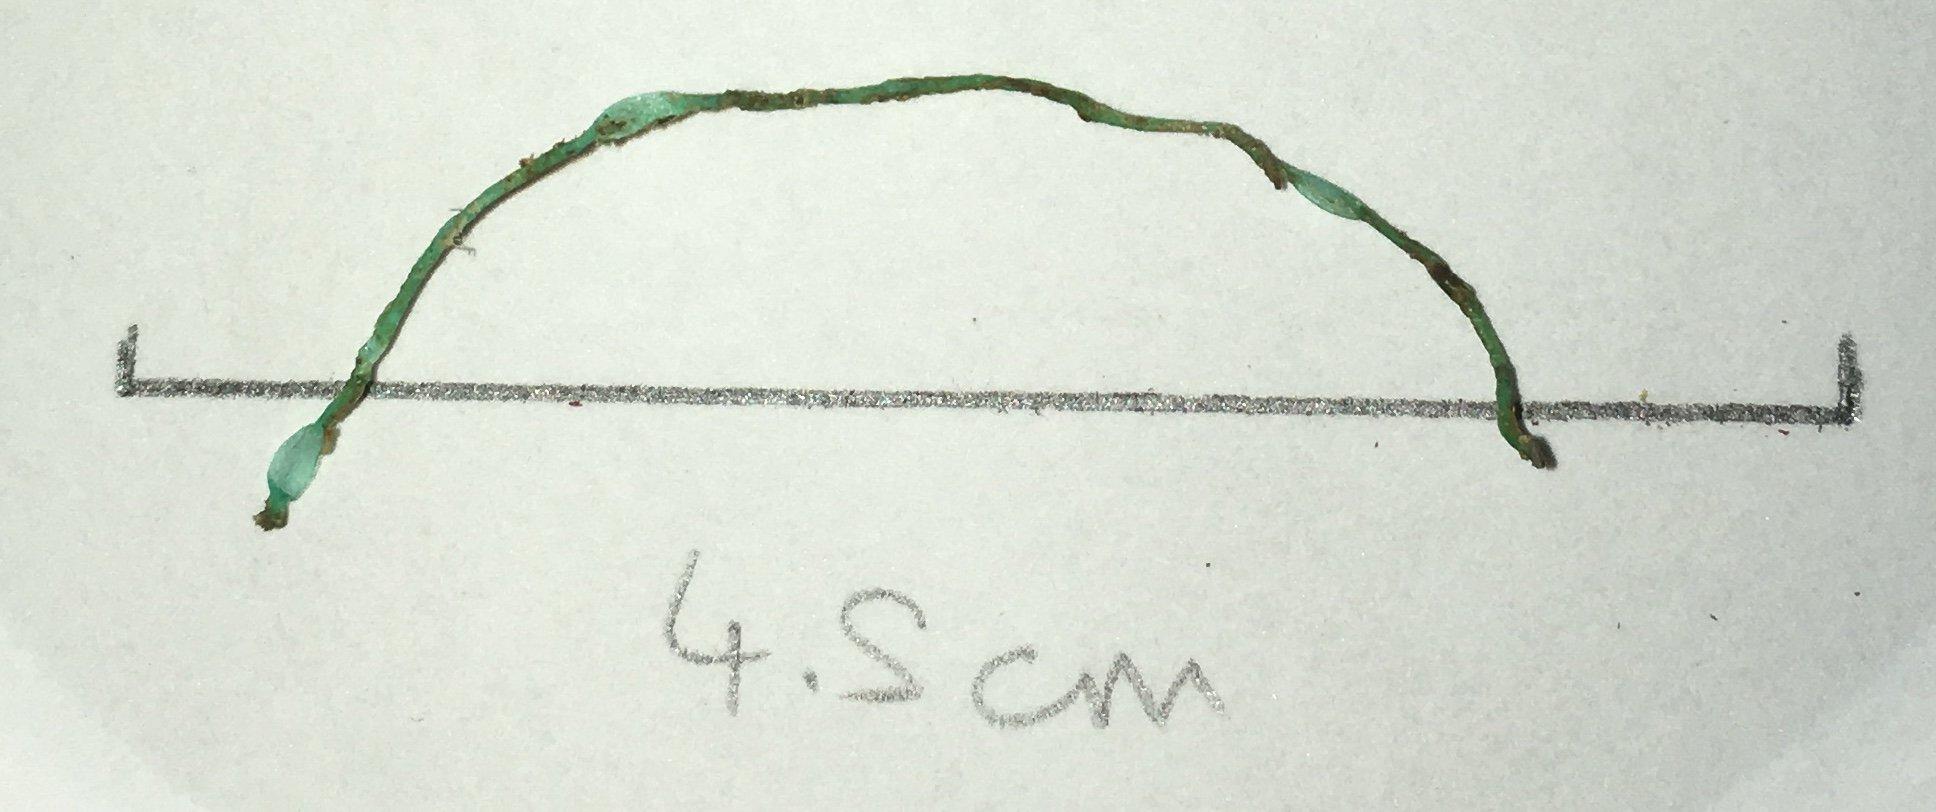 McGoran_Green fibre from a Thames Thornback Ray.jpg